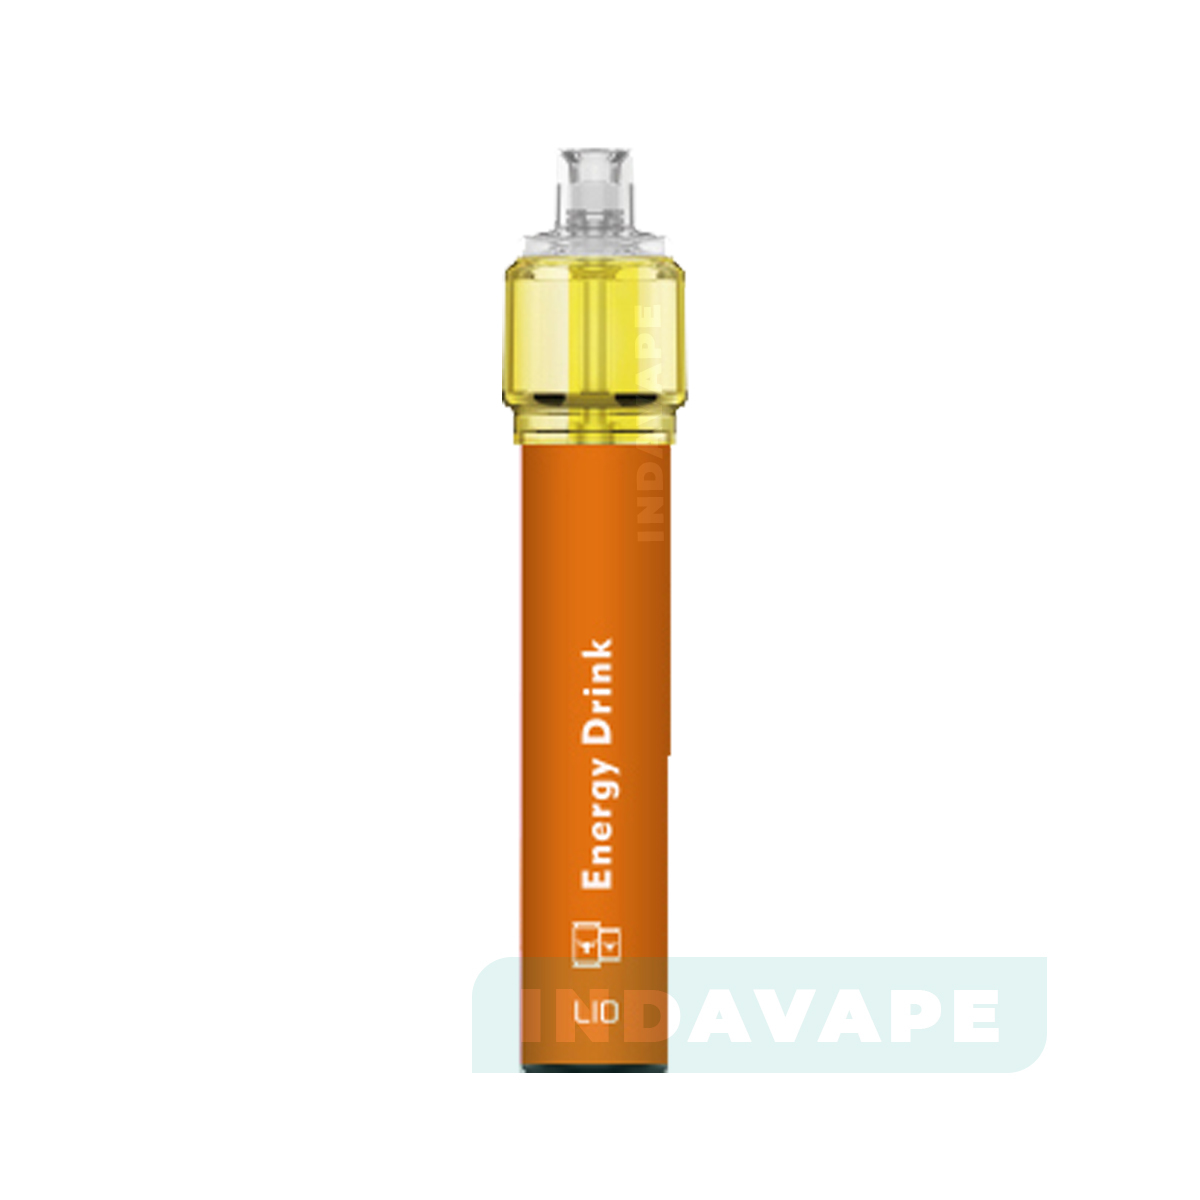 Одноразовая электронная сигарета lion bee inhale 400 одноразовая электронная сигарета